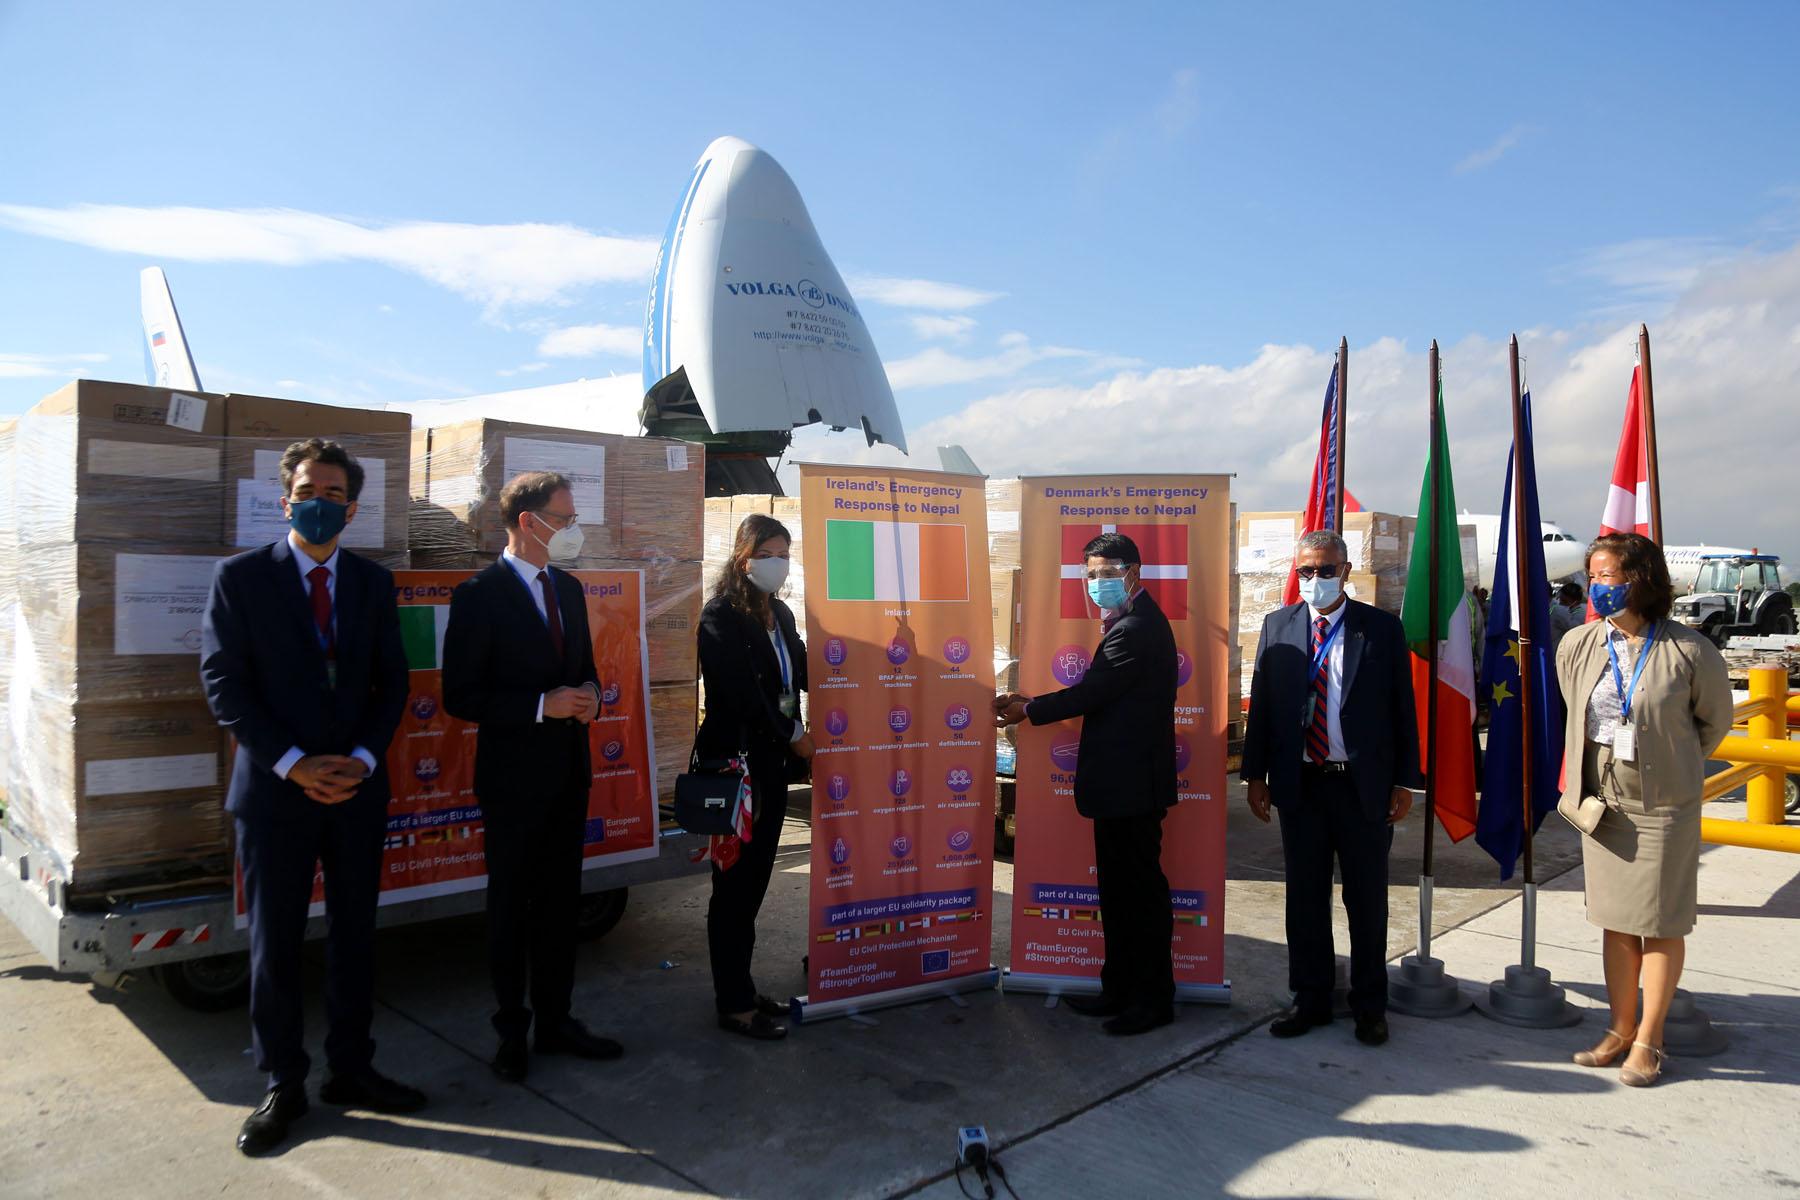 Nepal receives health supplies from Ireland, Denmark